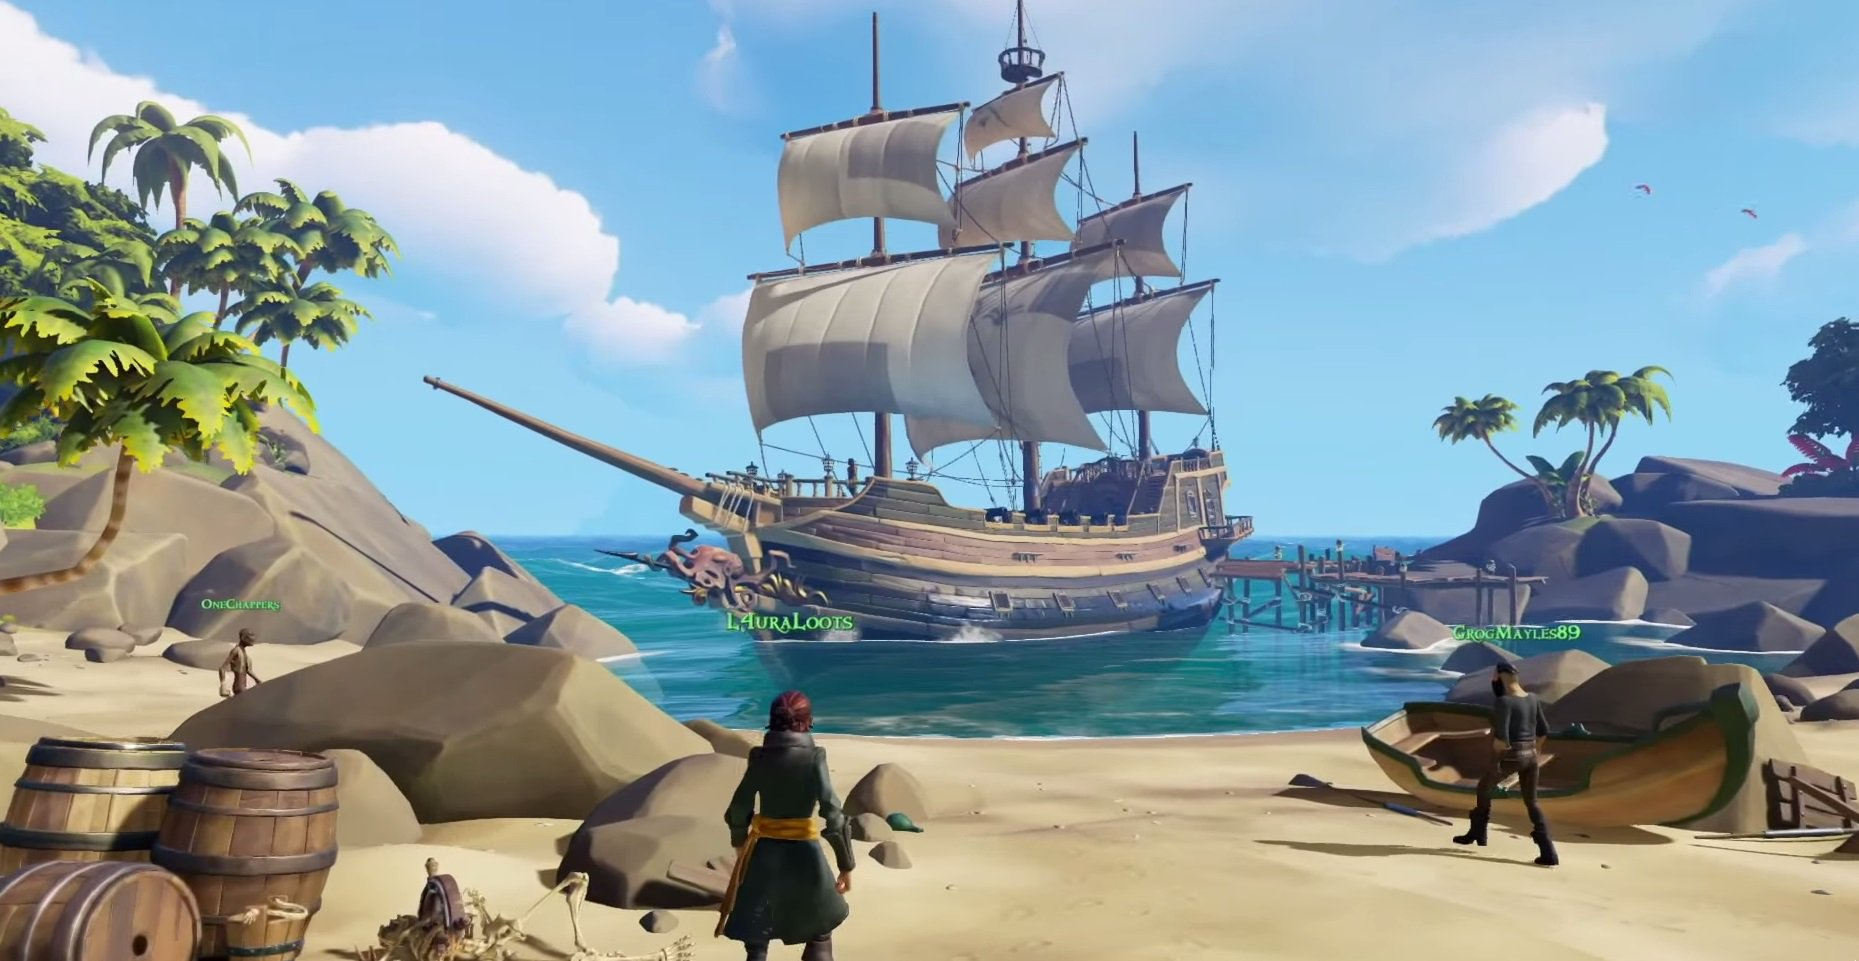 Sea of Thieves první aktualizace klienta